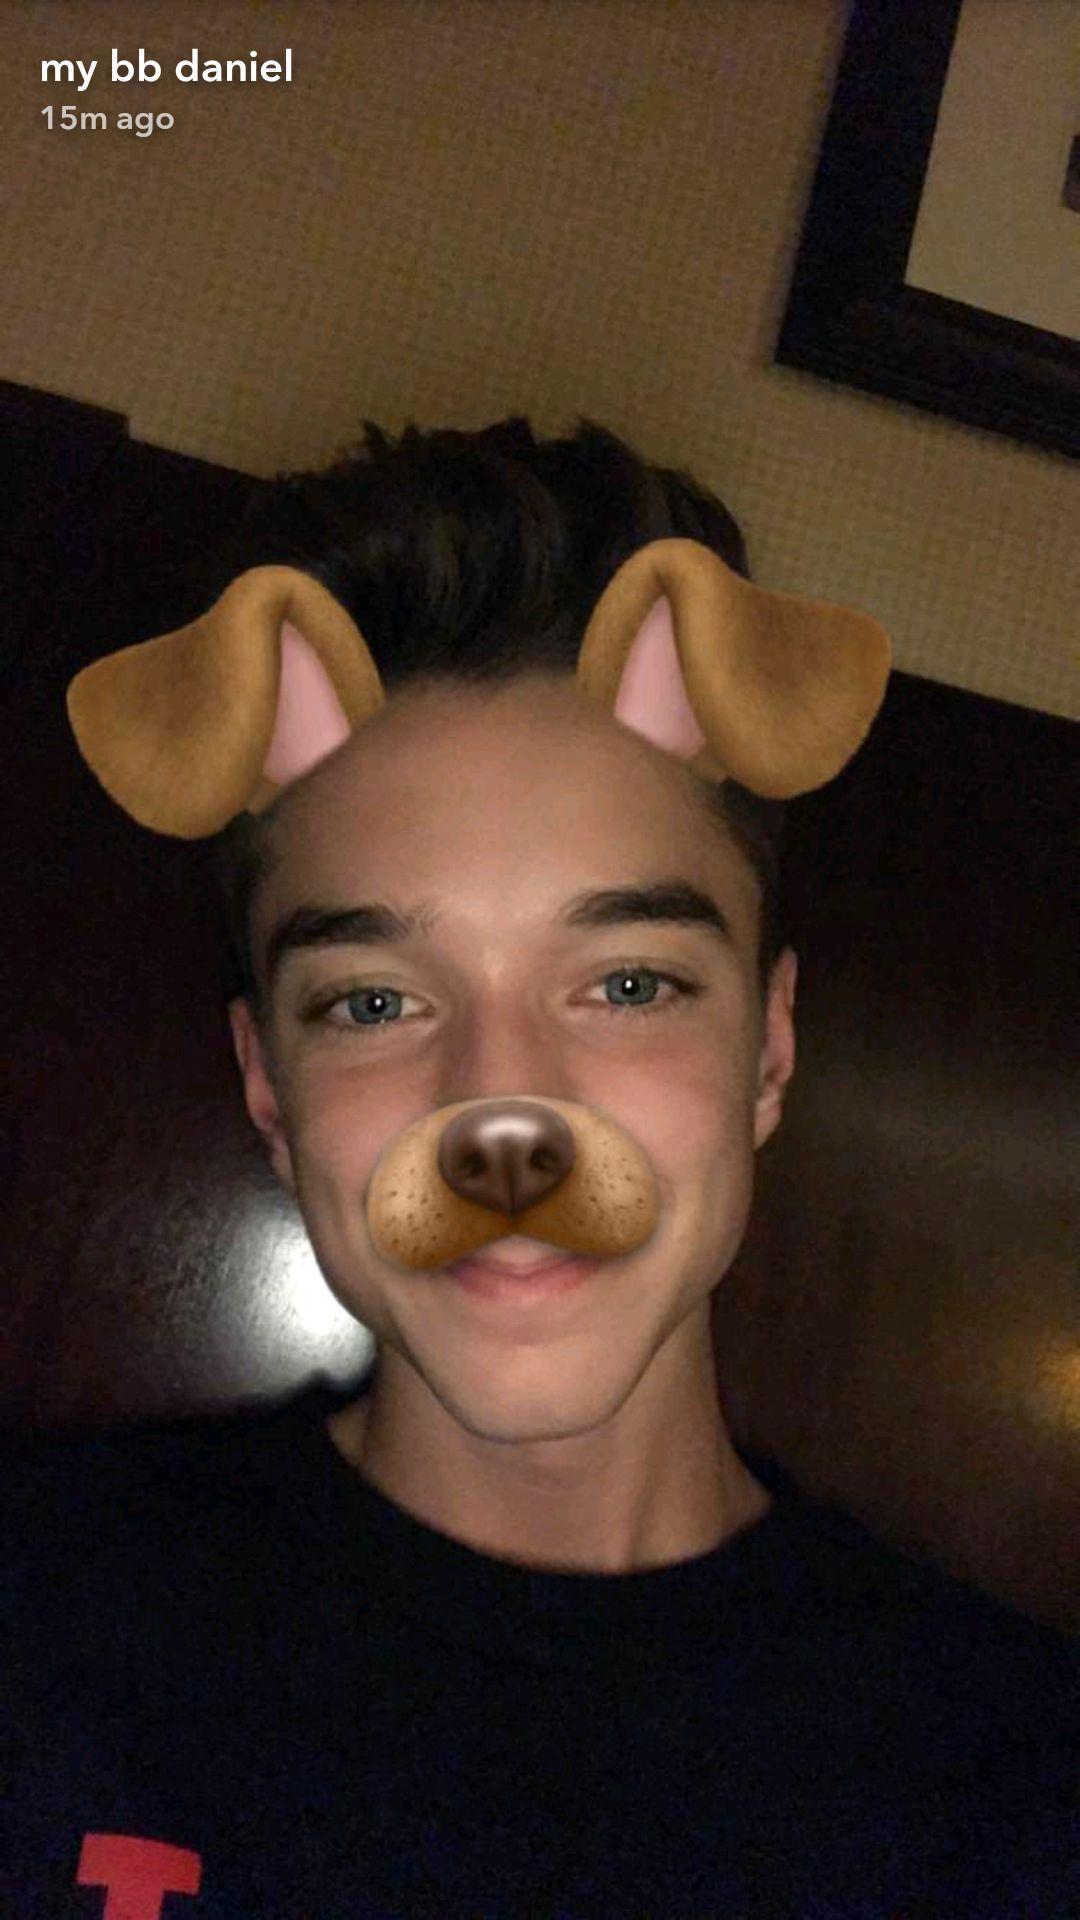 Daniel smith snapchat